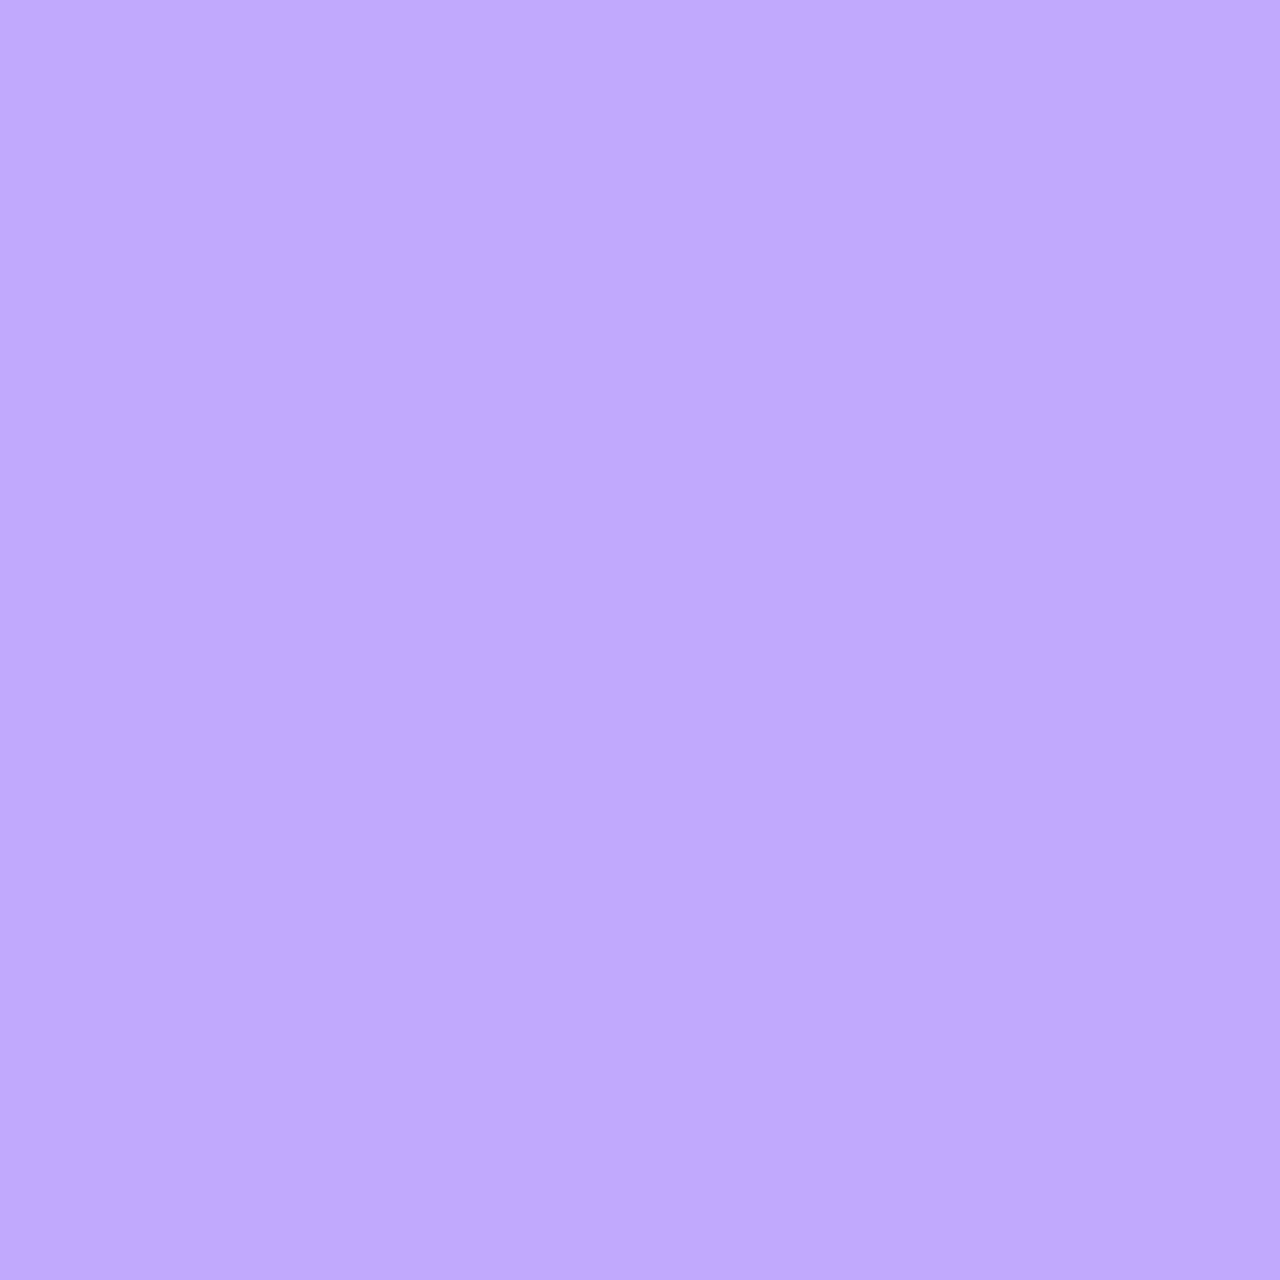 "#0055 Rosco Gels Roscolux Lilac, 20x24"""